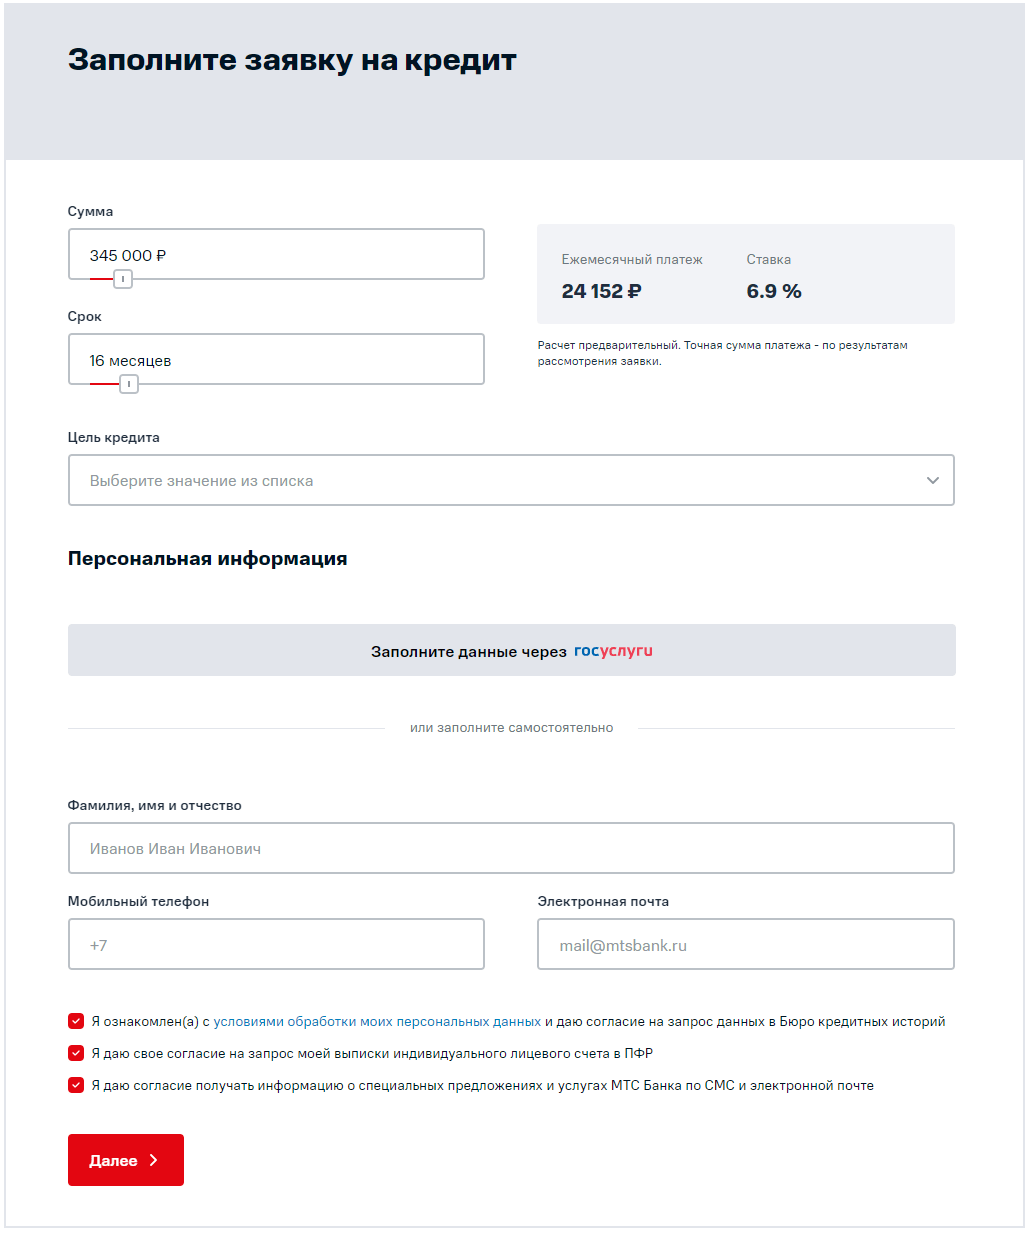 заявление-анкета на кредит